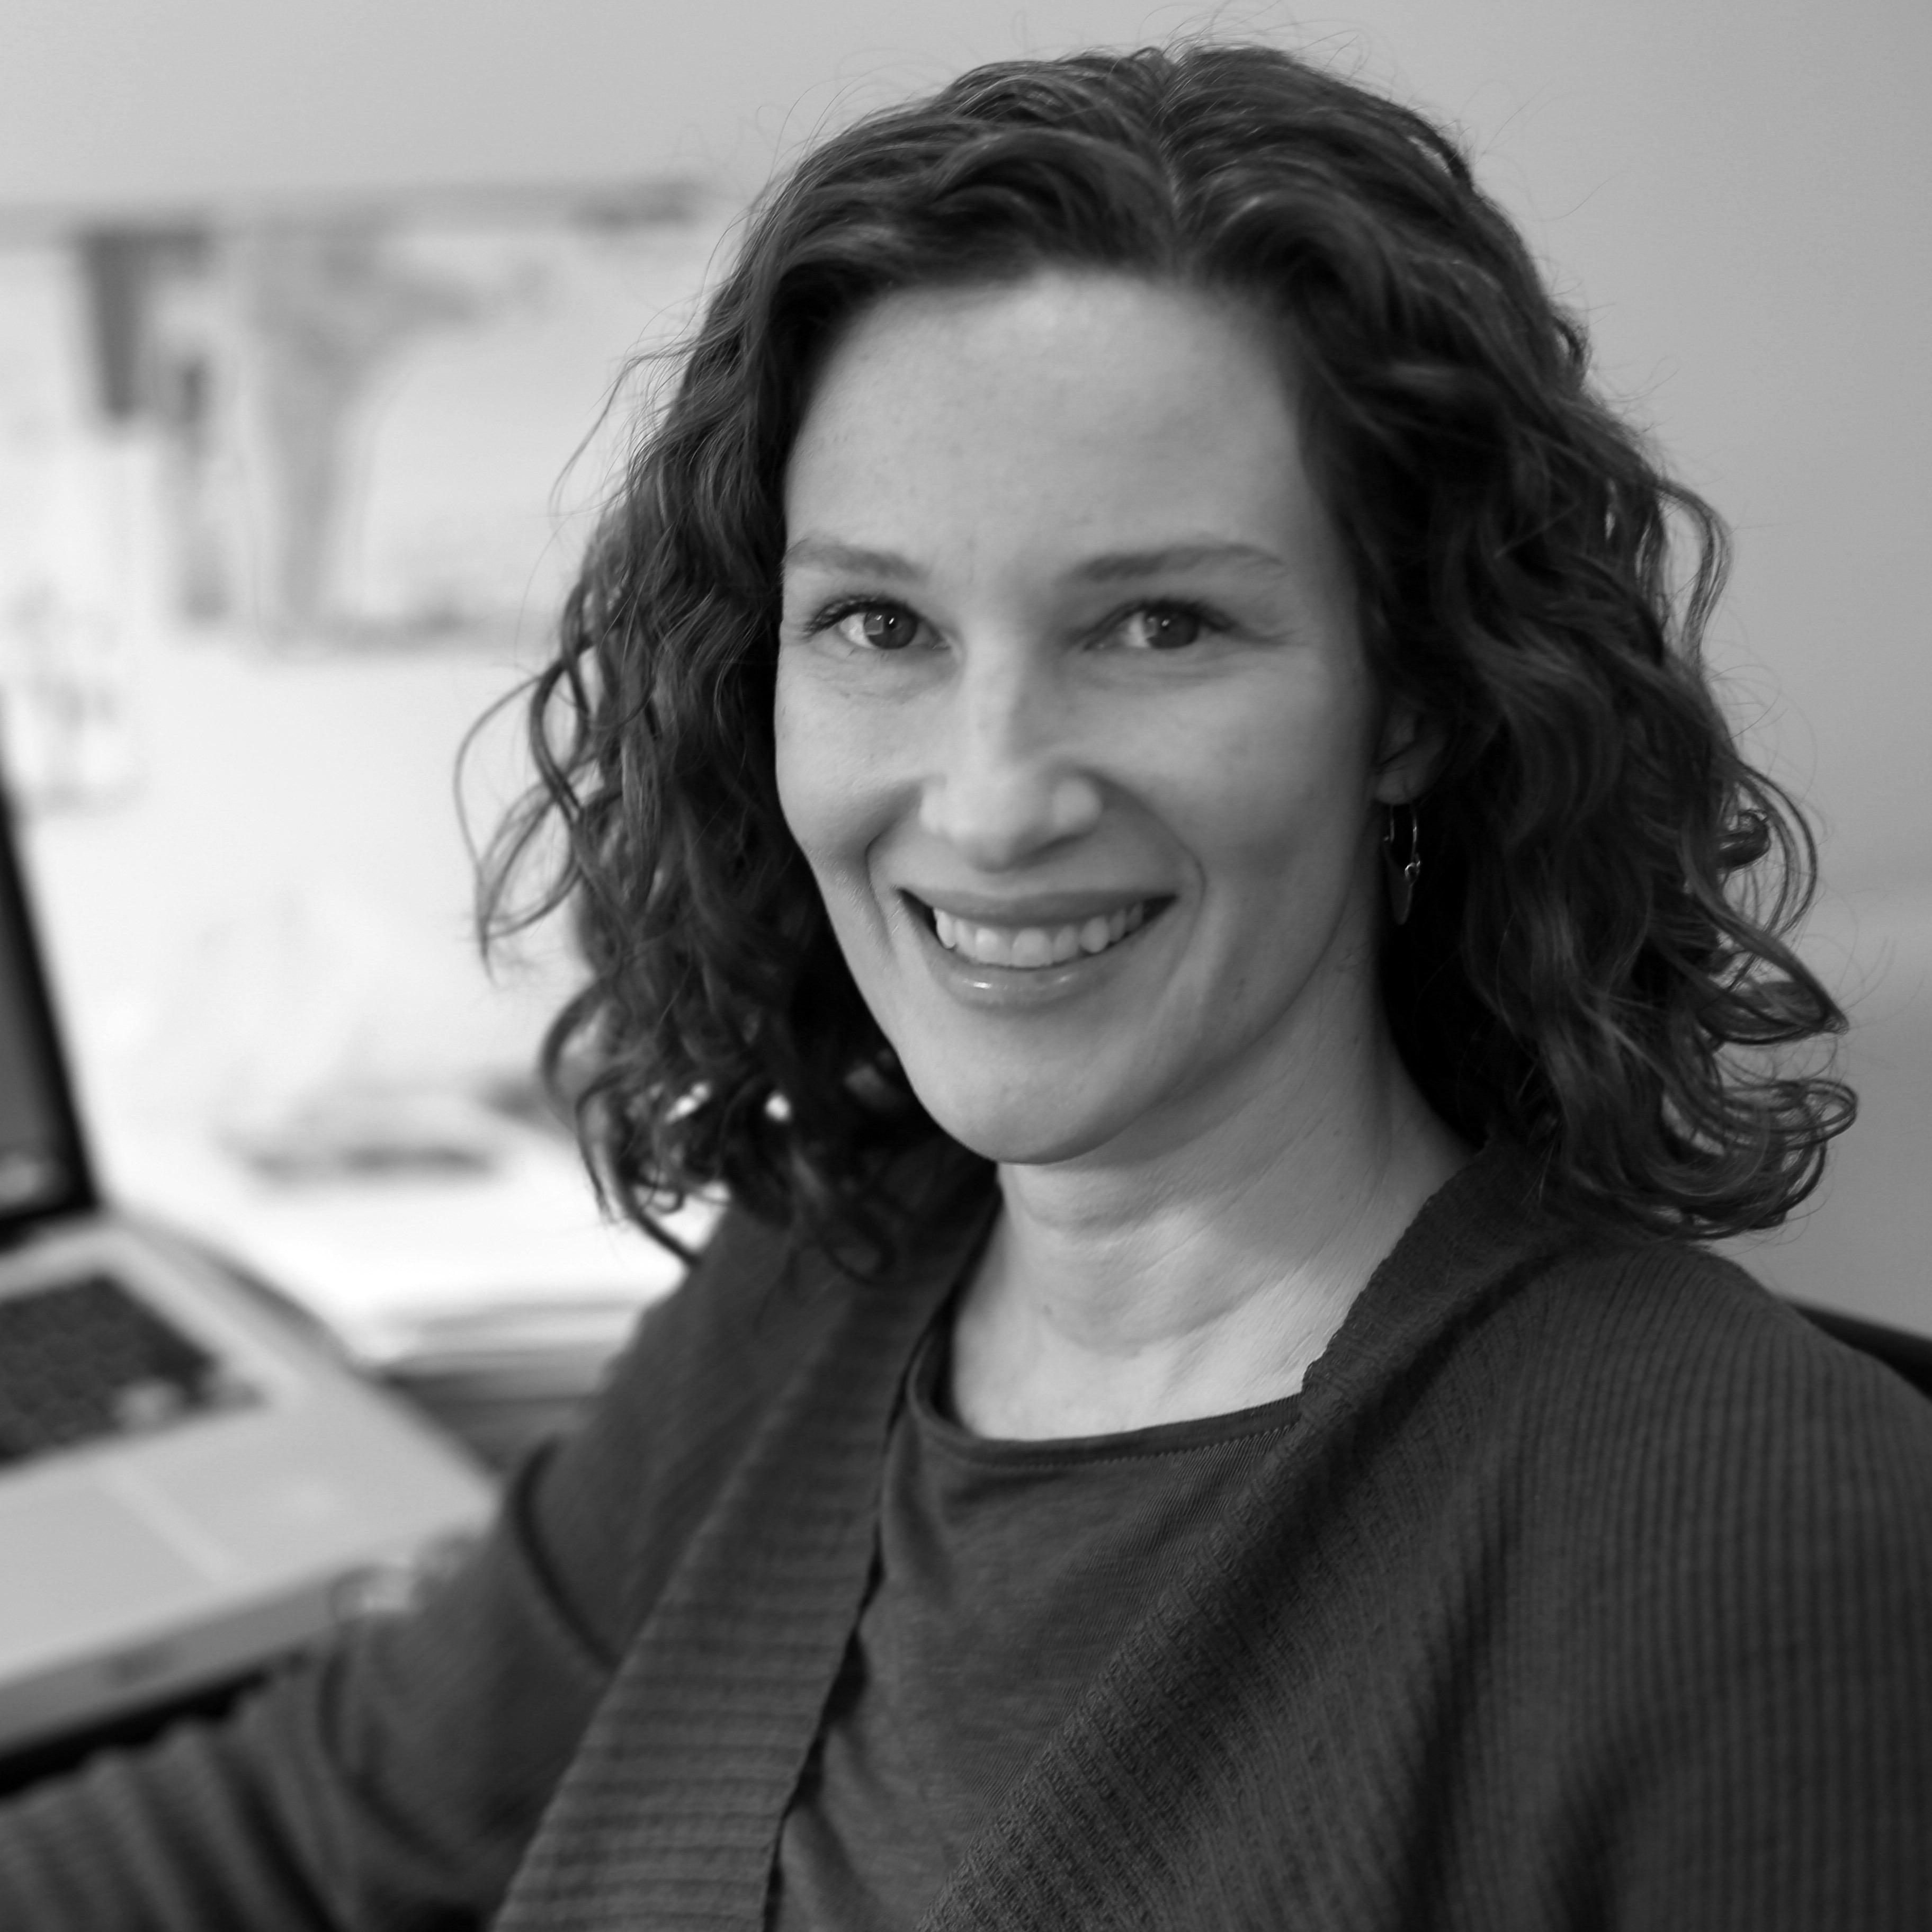 iEARN-USA Change Maker: Bridget